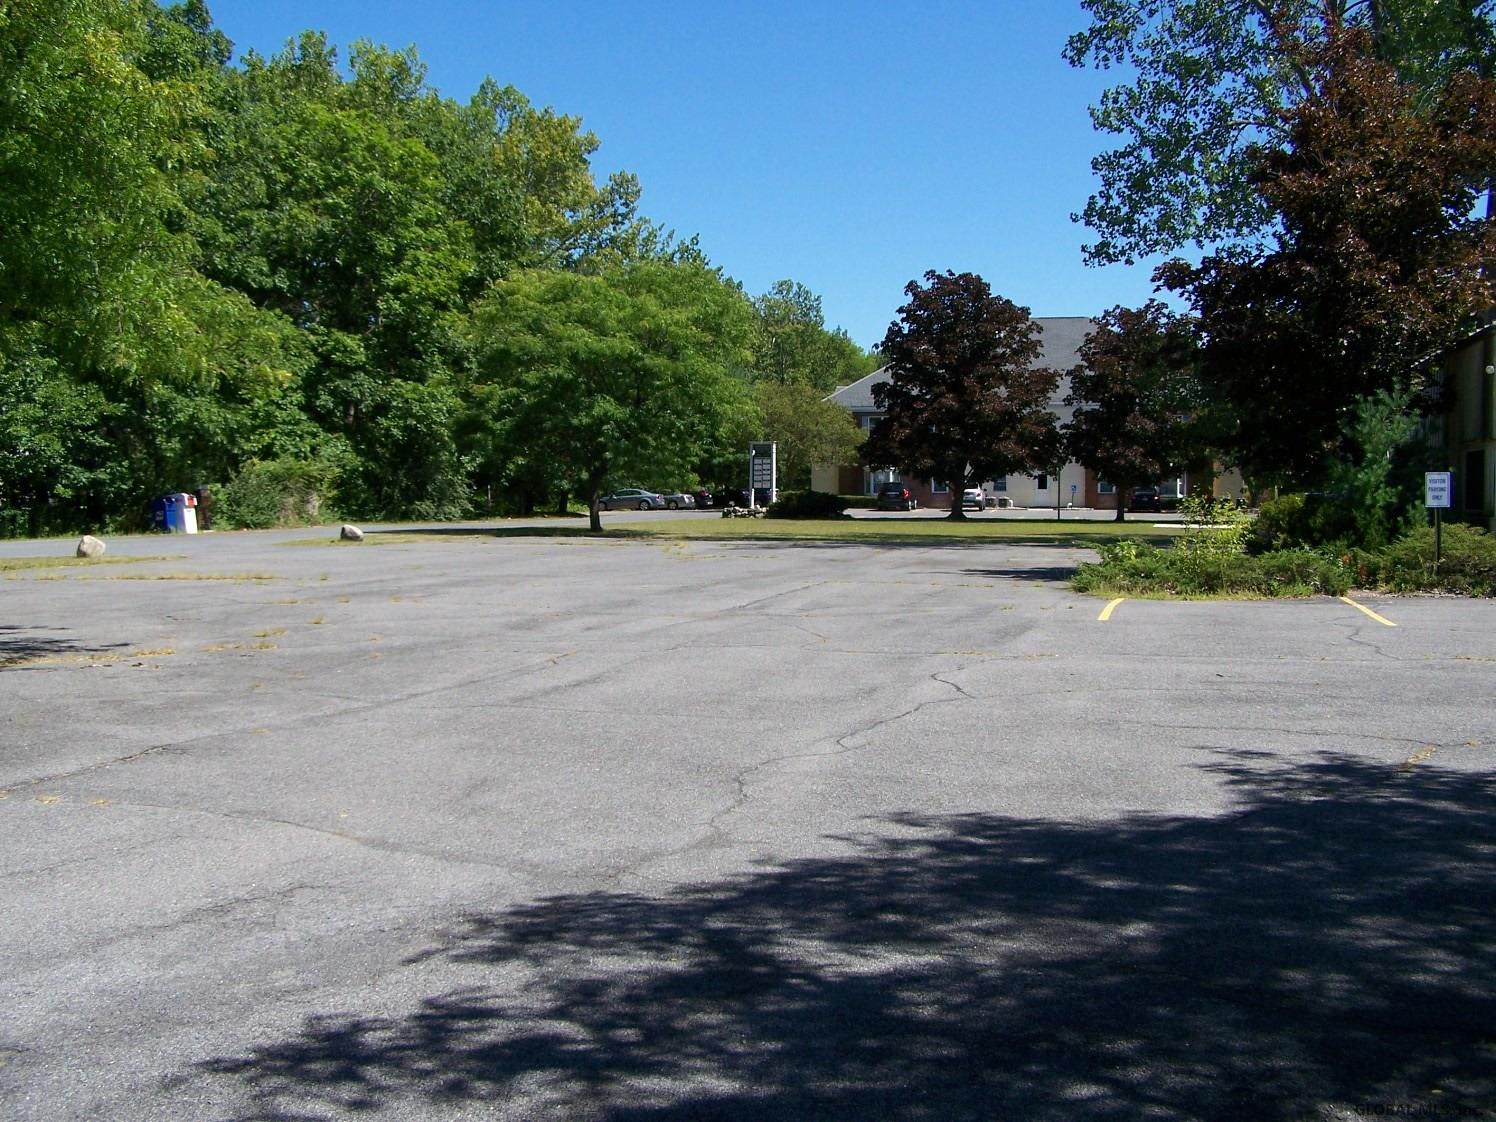 Albany image 4